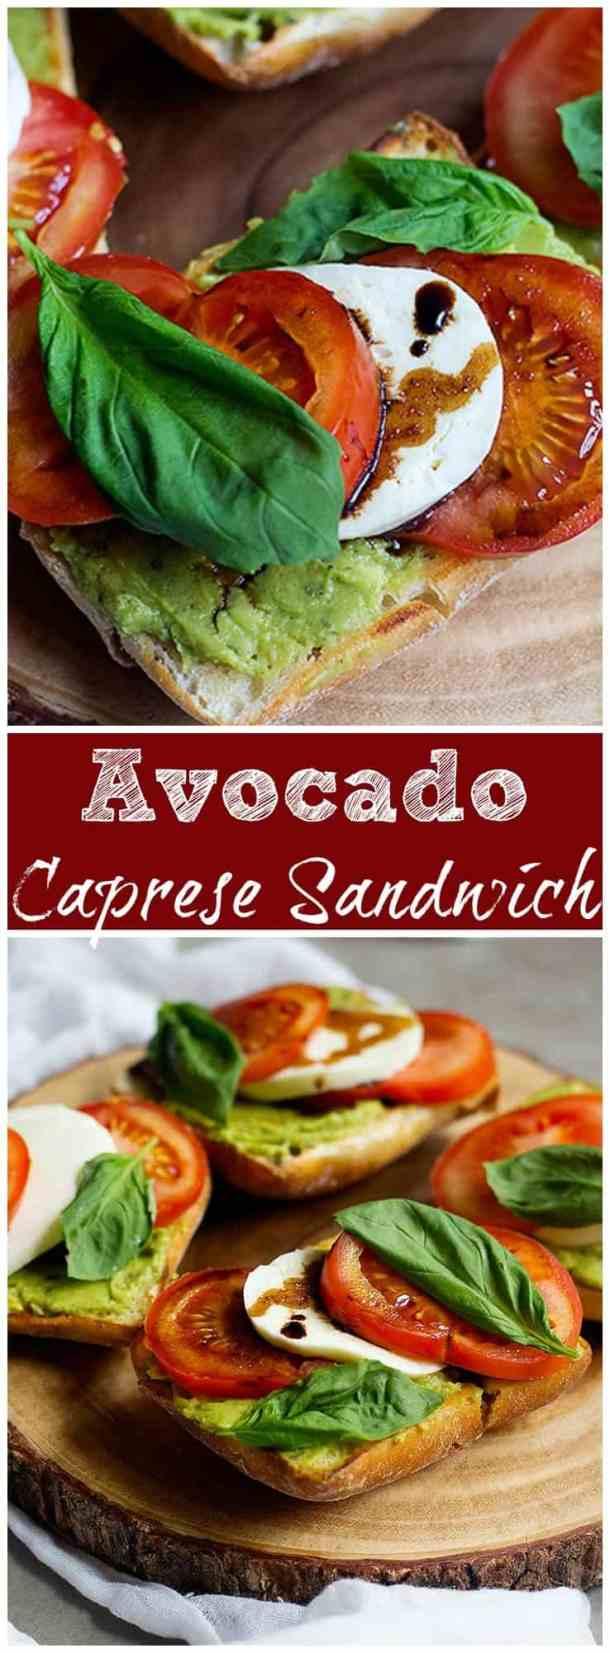 Caprese Sandwich Recipe | Avocado Caprese Sandwich | Caprese Sandwich pesto | Caprese Sandwich Balsamic | Caprese Sandwich Baked | Caprese Sandwich recipe Simple | #Caprese #CapreseSalad #CapreseSandwich #SandwichRecipe #EasySandwich